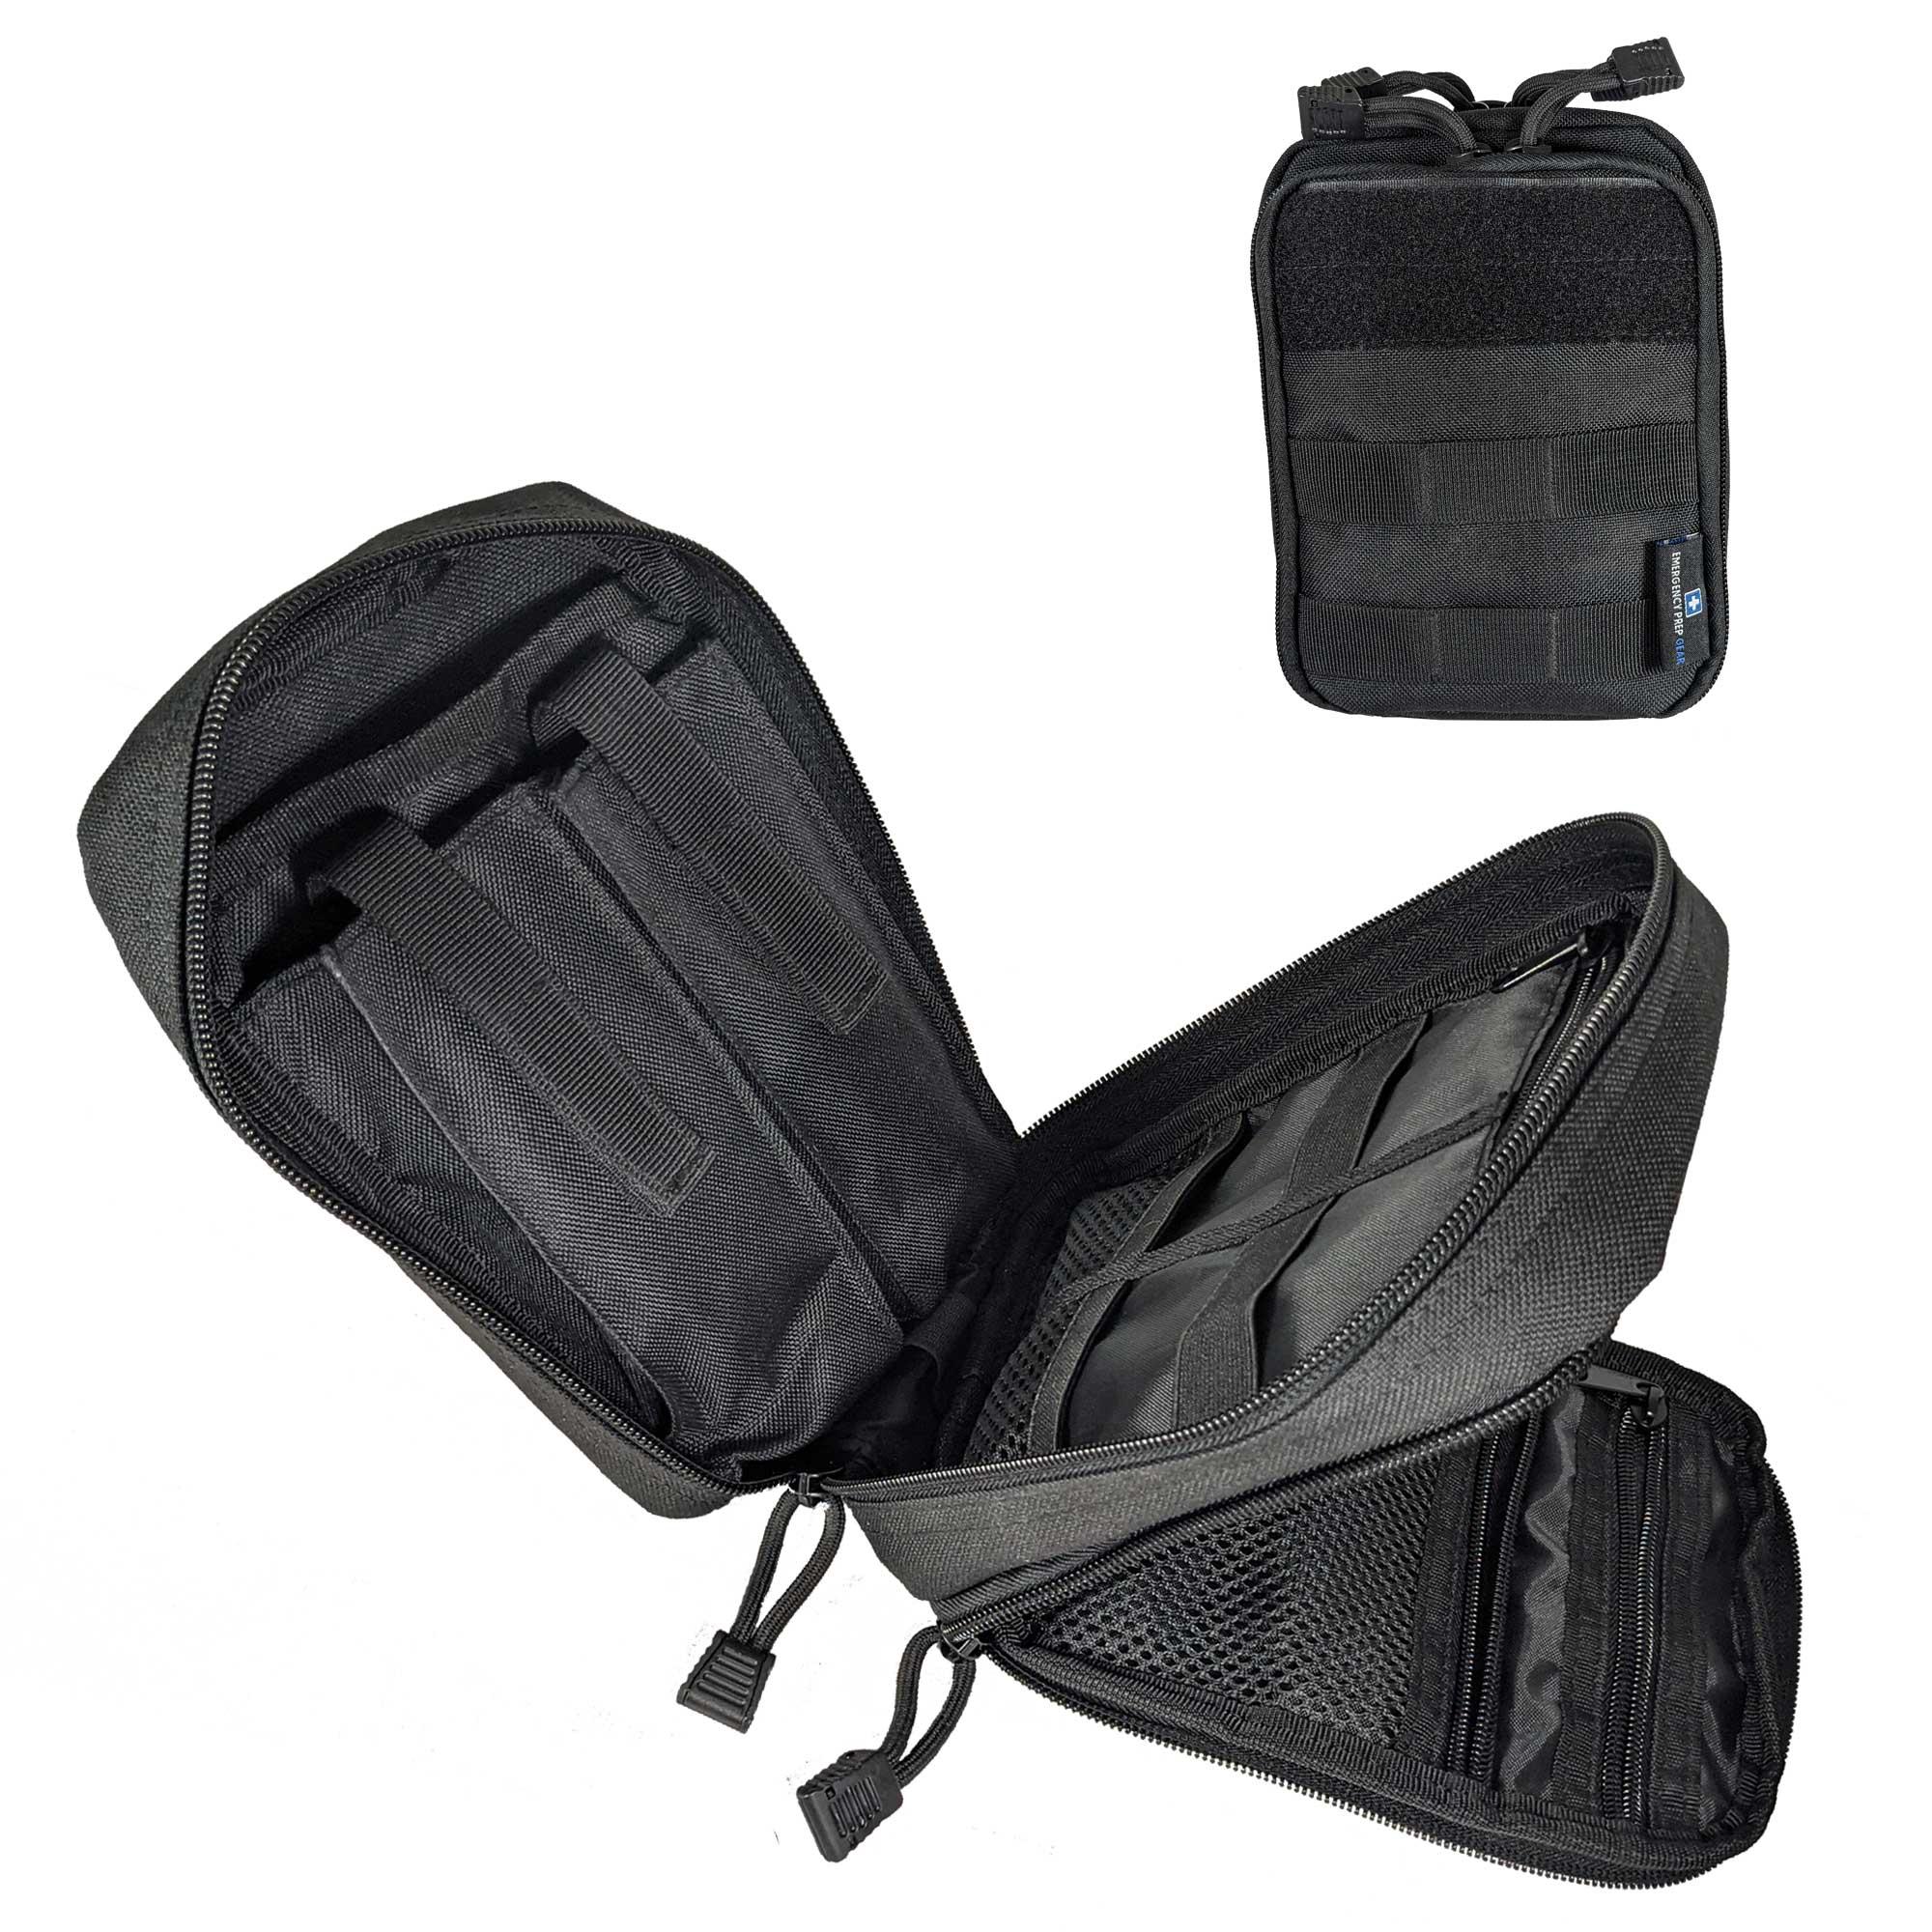 21 10 01 14 39 47 original b09dr49ctv epg gear compact black main